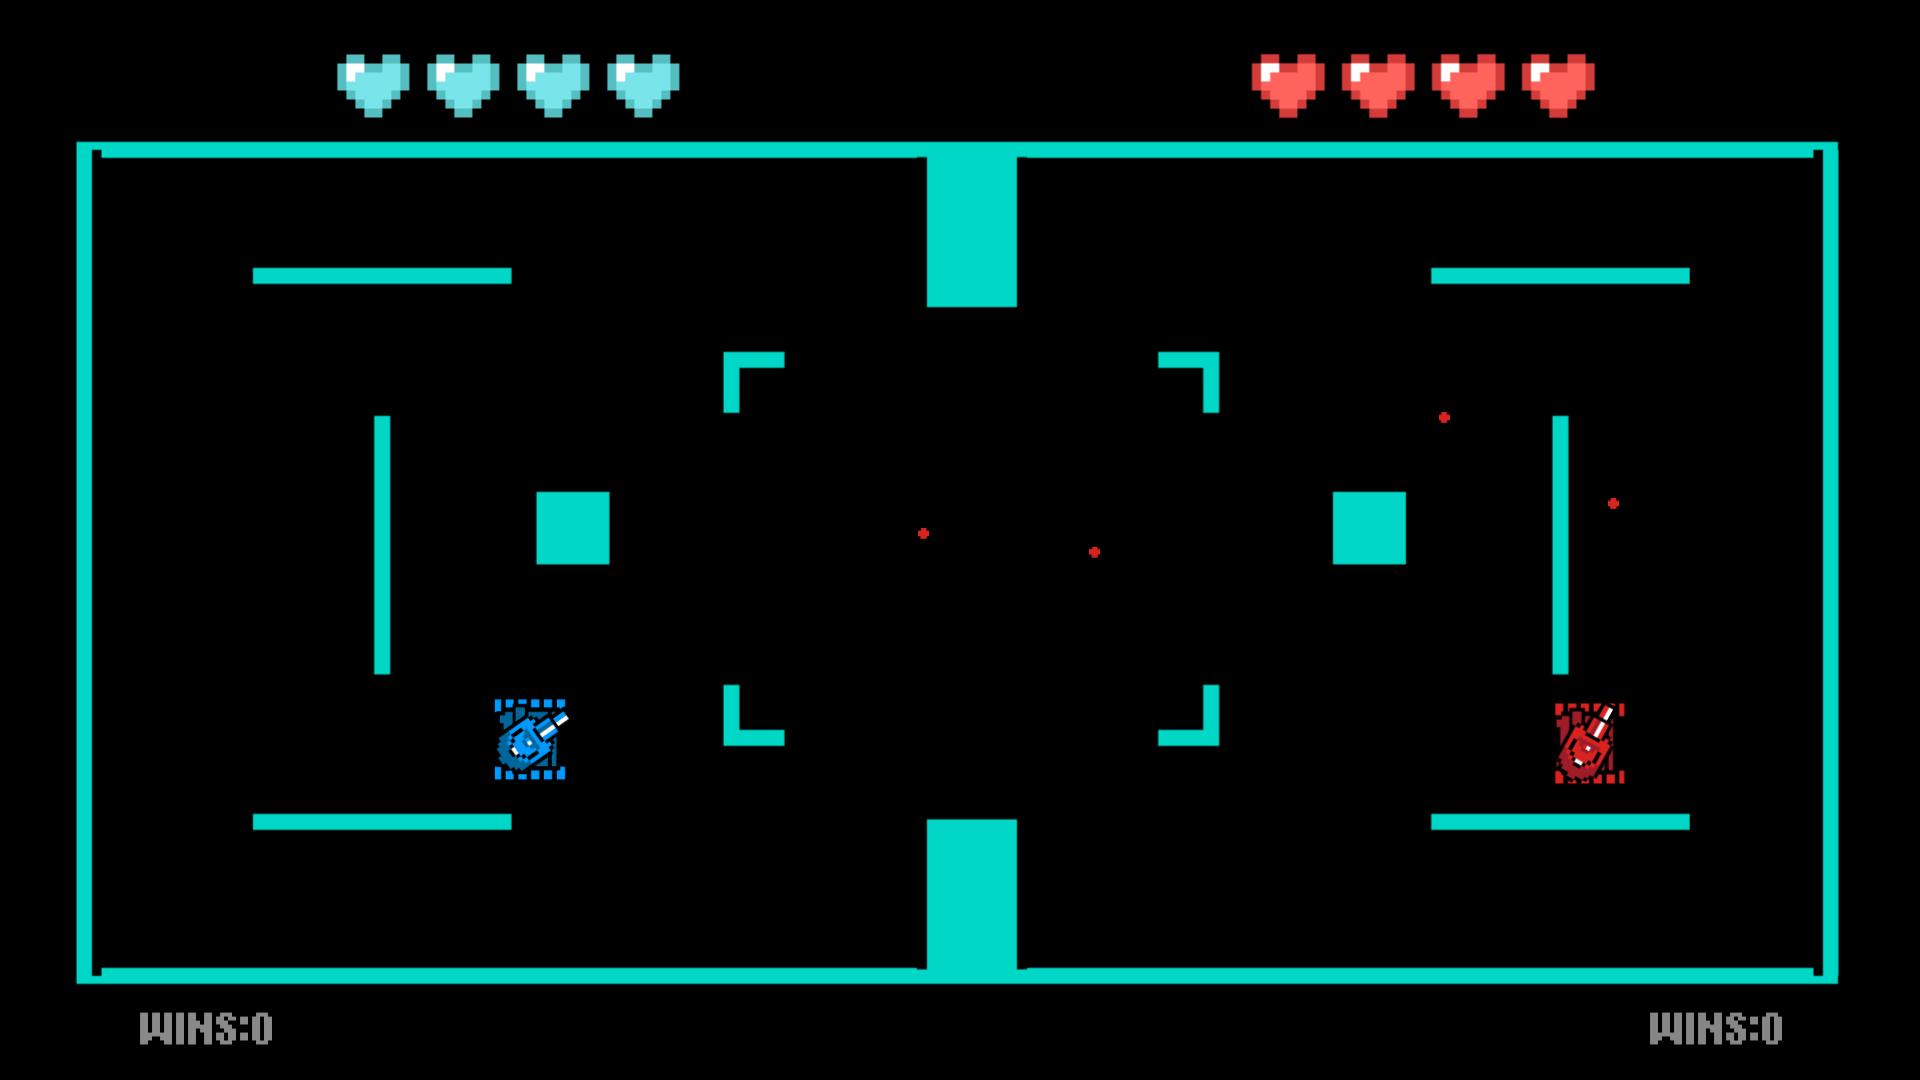 Tank Battle - 2 Player Classic Arcade Game screenshot 2